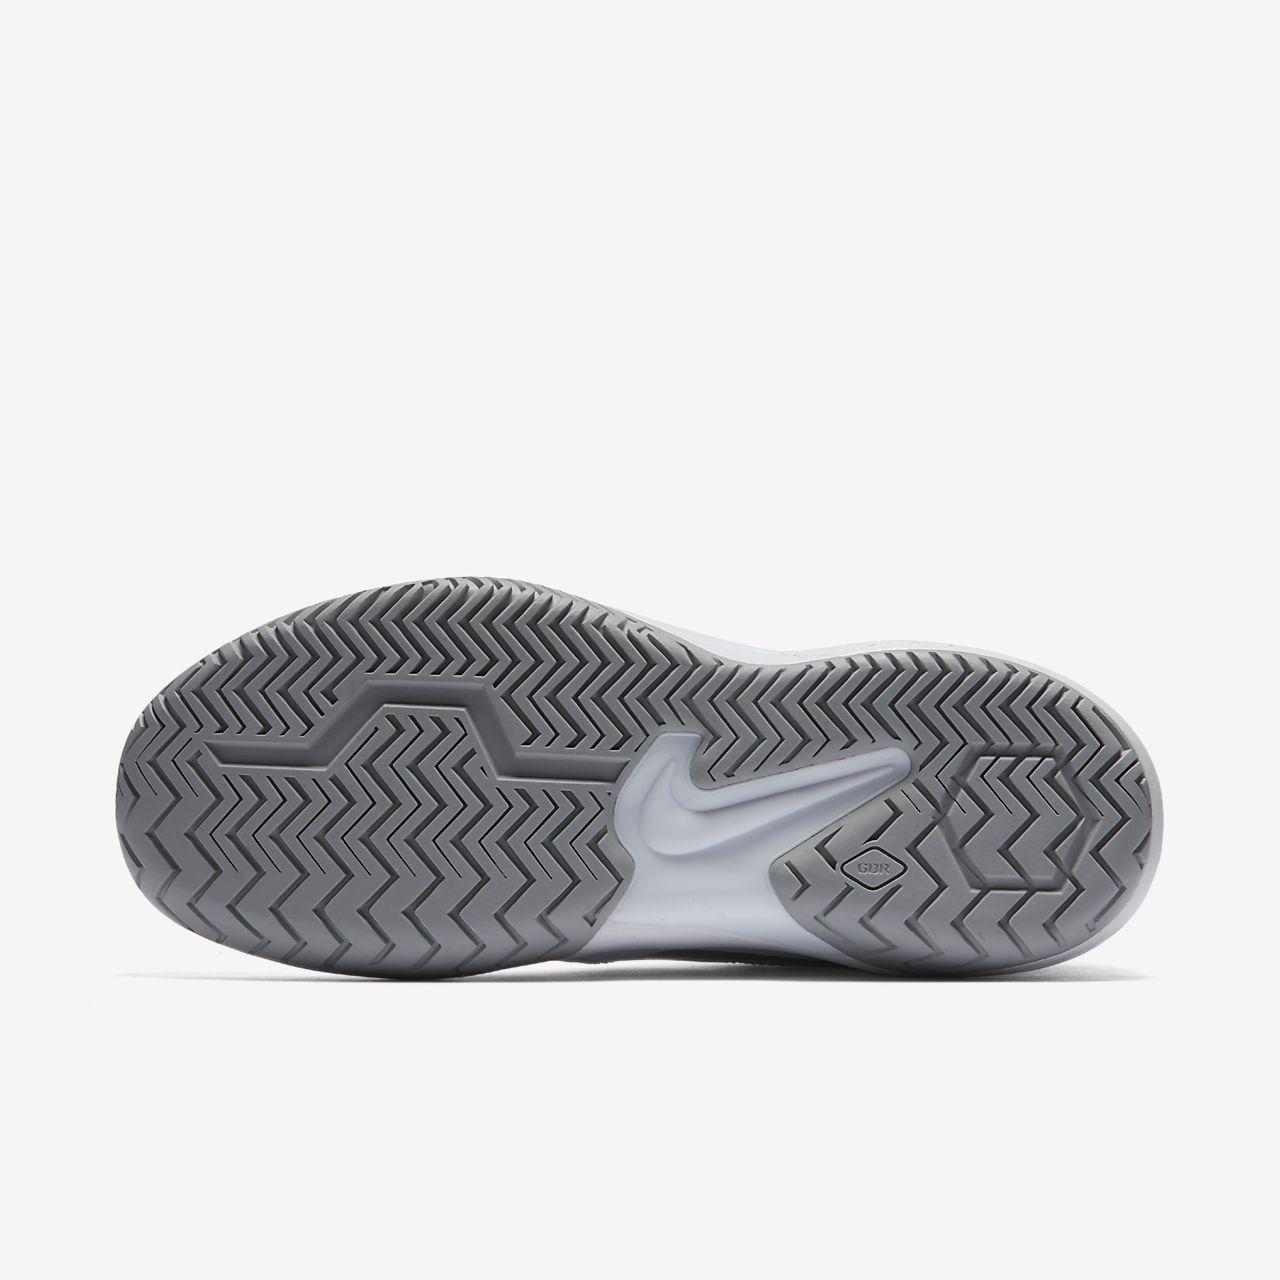 new arrival 9e8a0 c516e Nike Wmns Air Zoom Resistance Court White Women Tennis Shoes Sneakers  918201-101. PieSanto Chaussure Femme ...